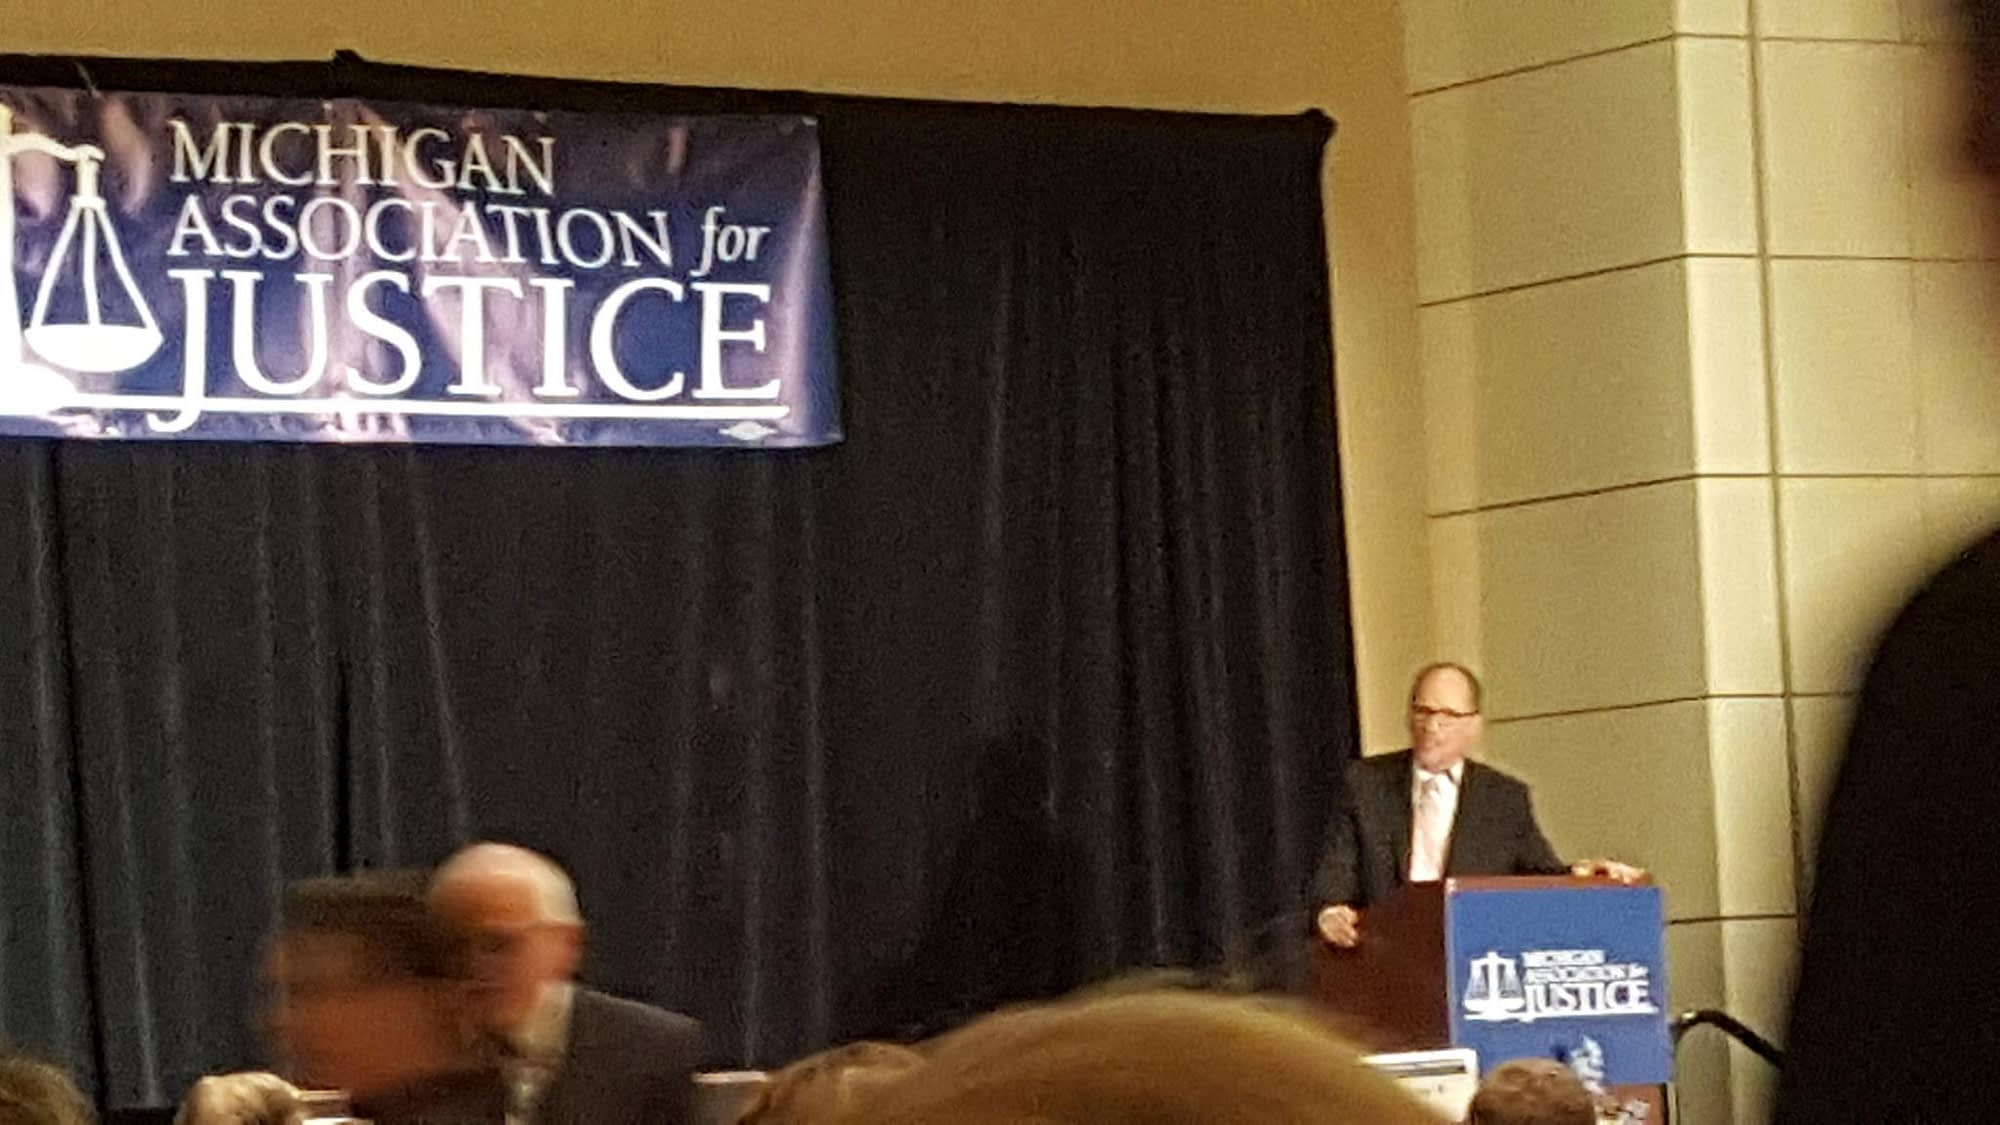 Tom Perez: 2017 Michigan Association for Justice dinner